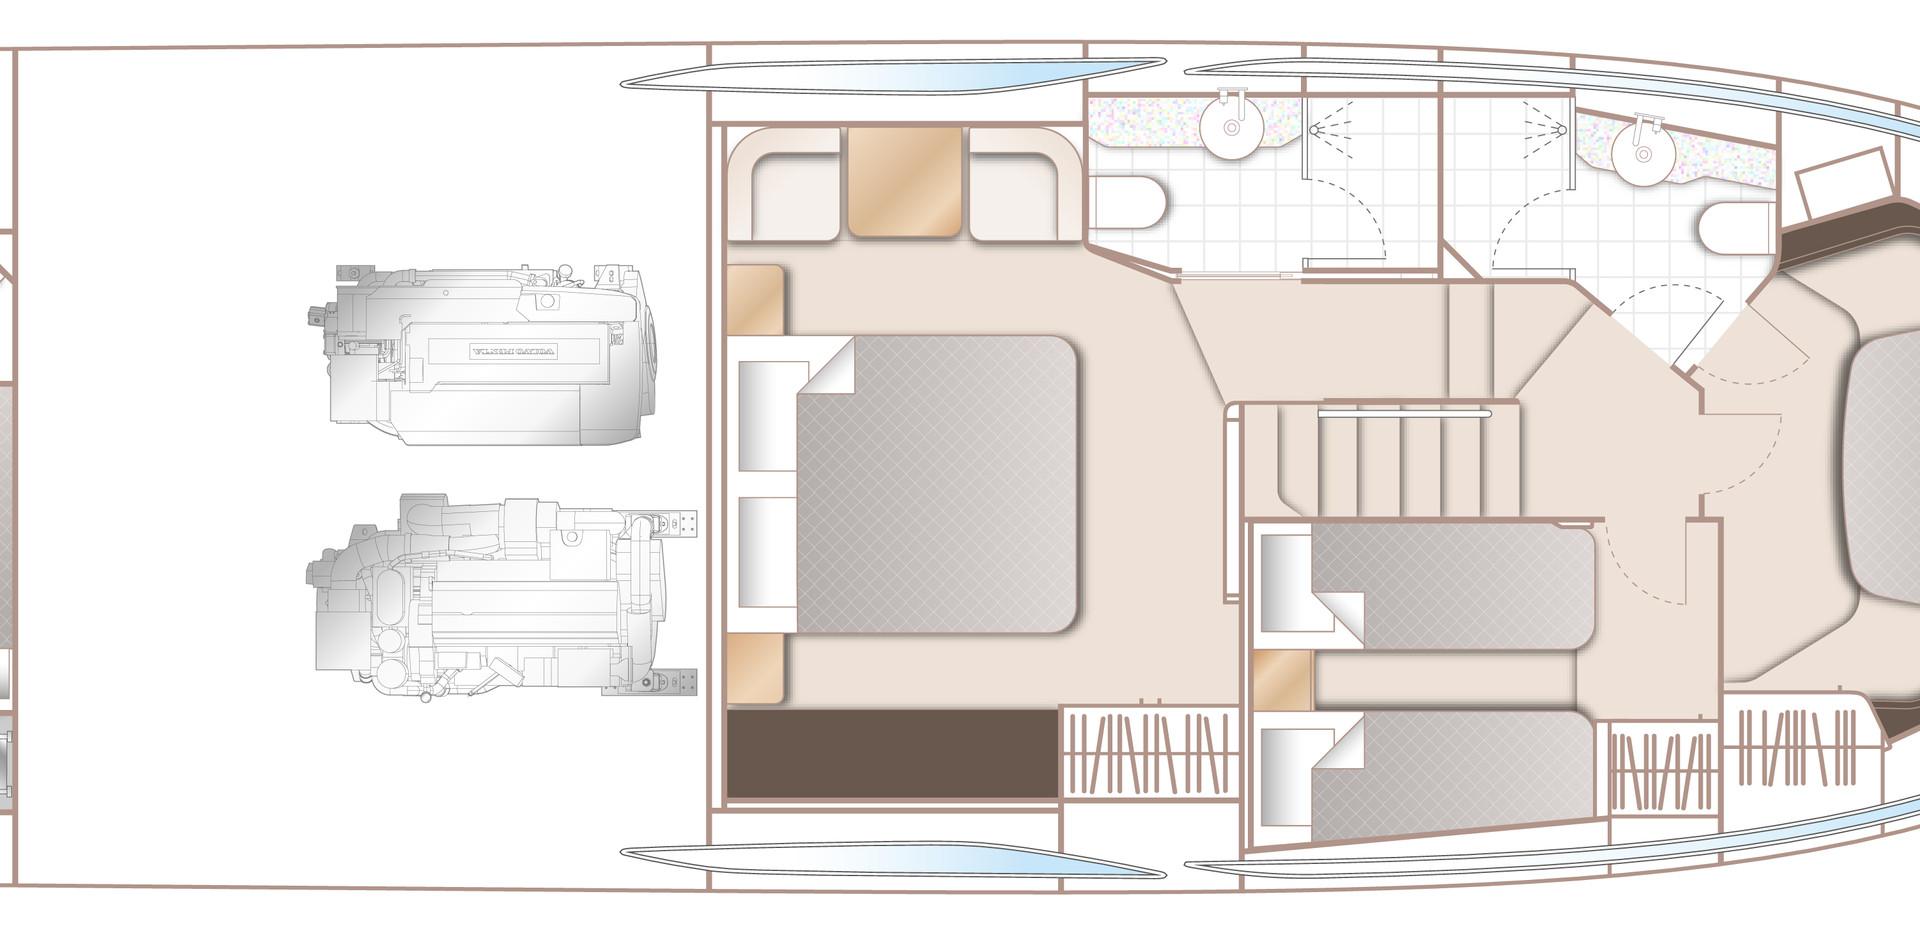 55-layout-lower-deck.jpg